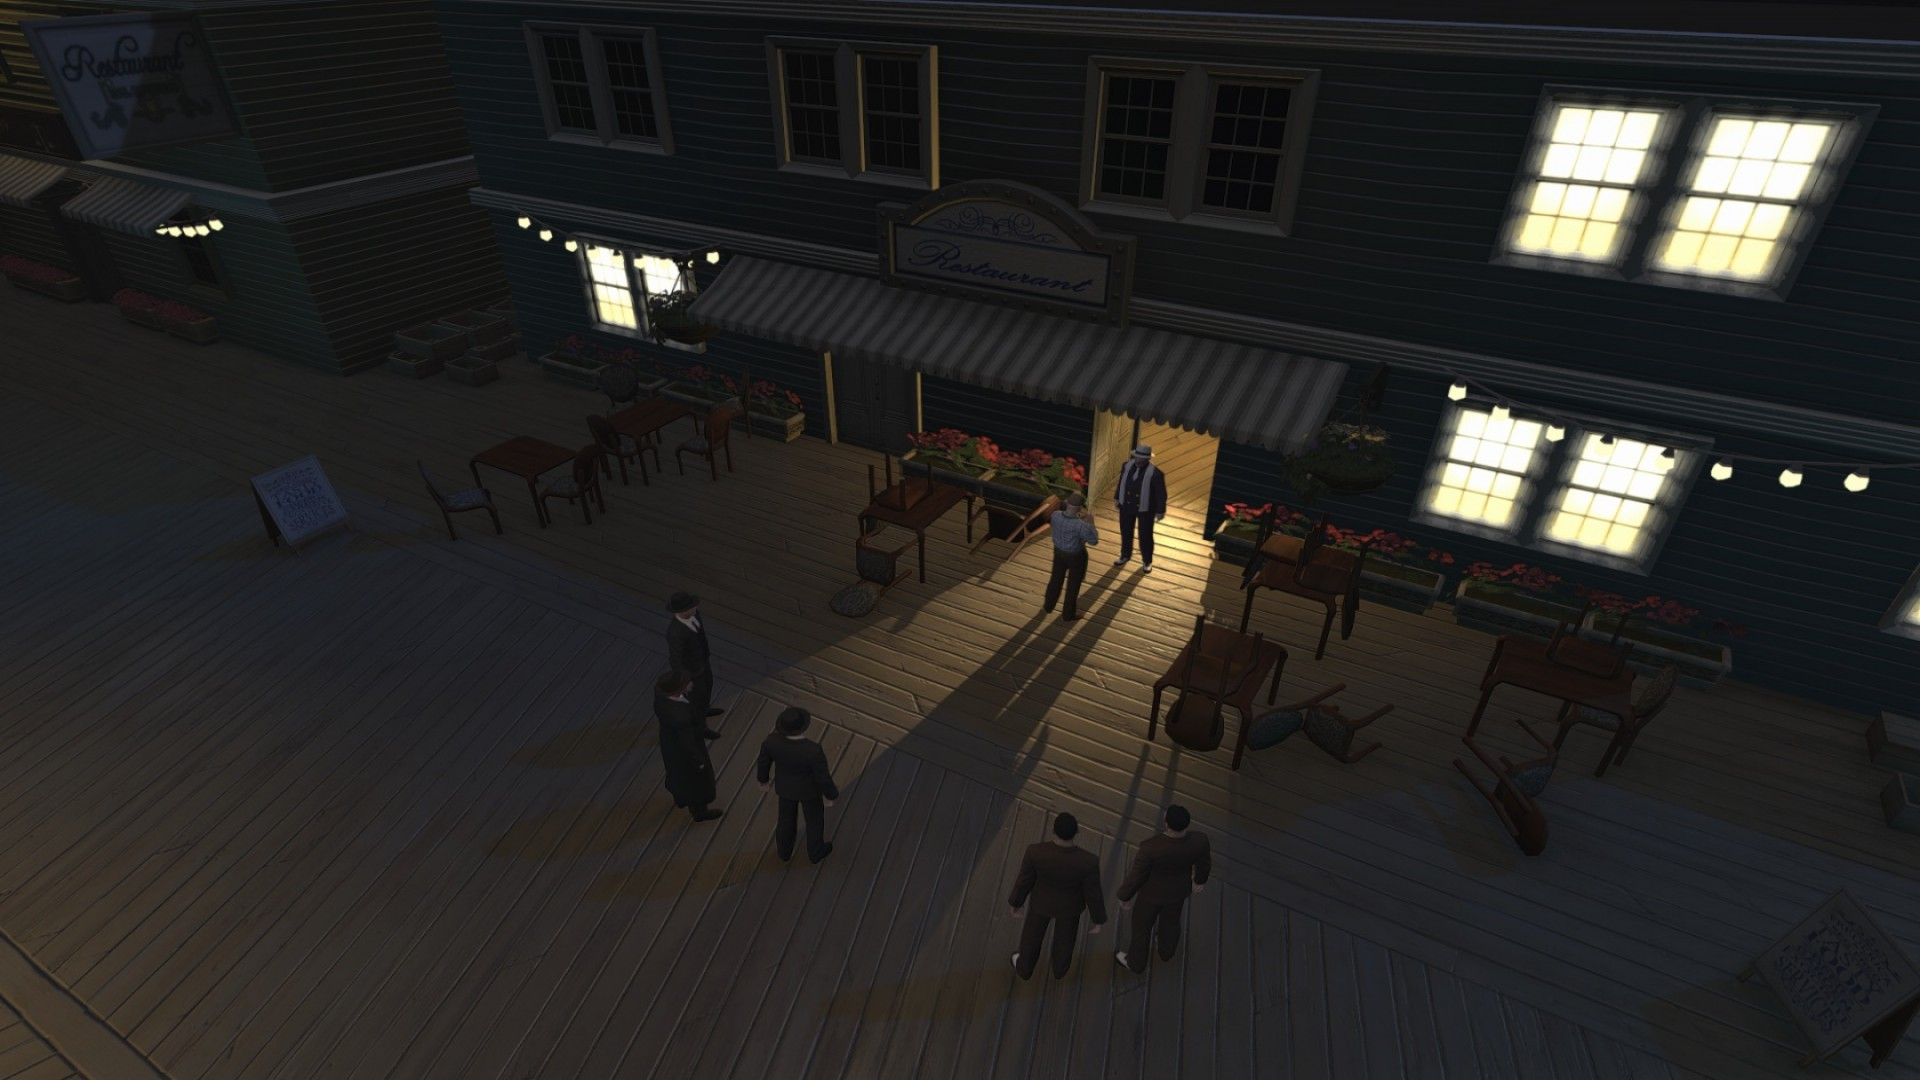 Omerta - City of Gangsters - Damsel in Distress DLC screenshot